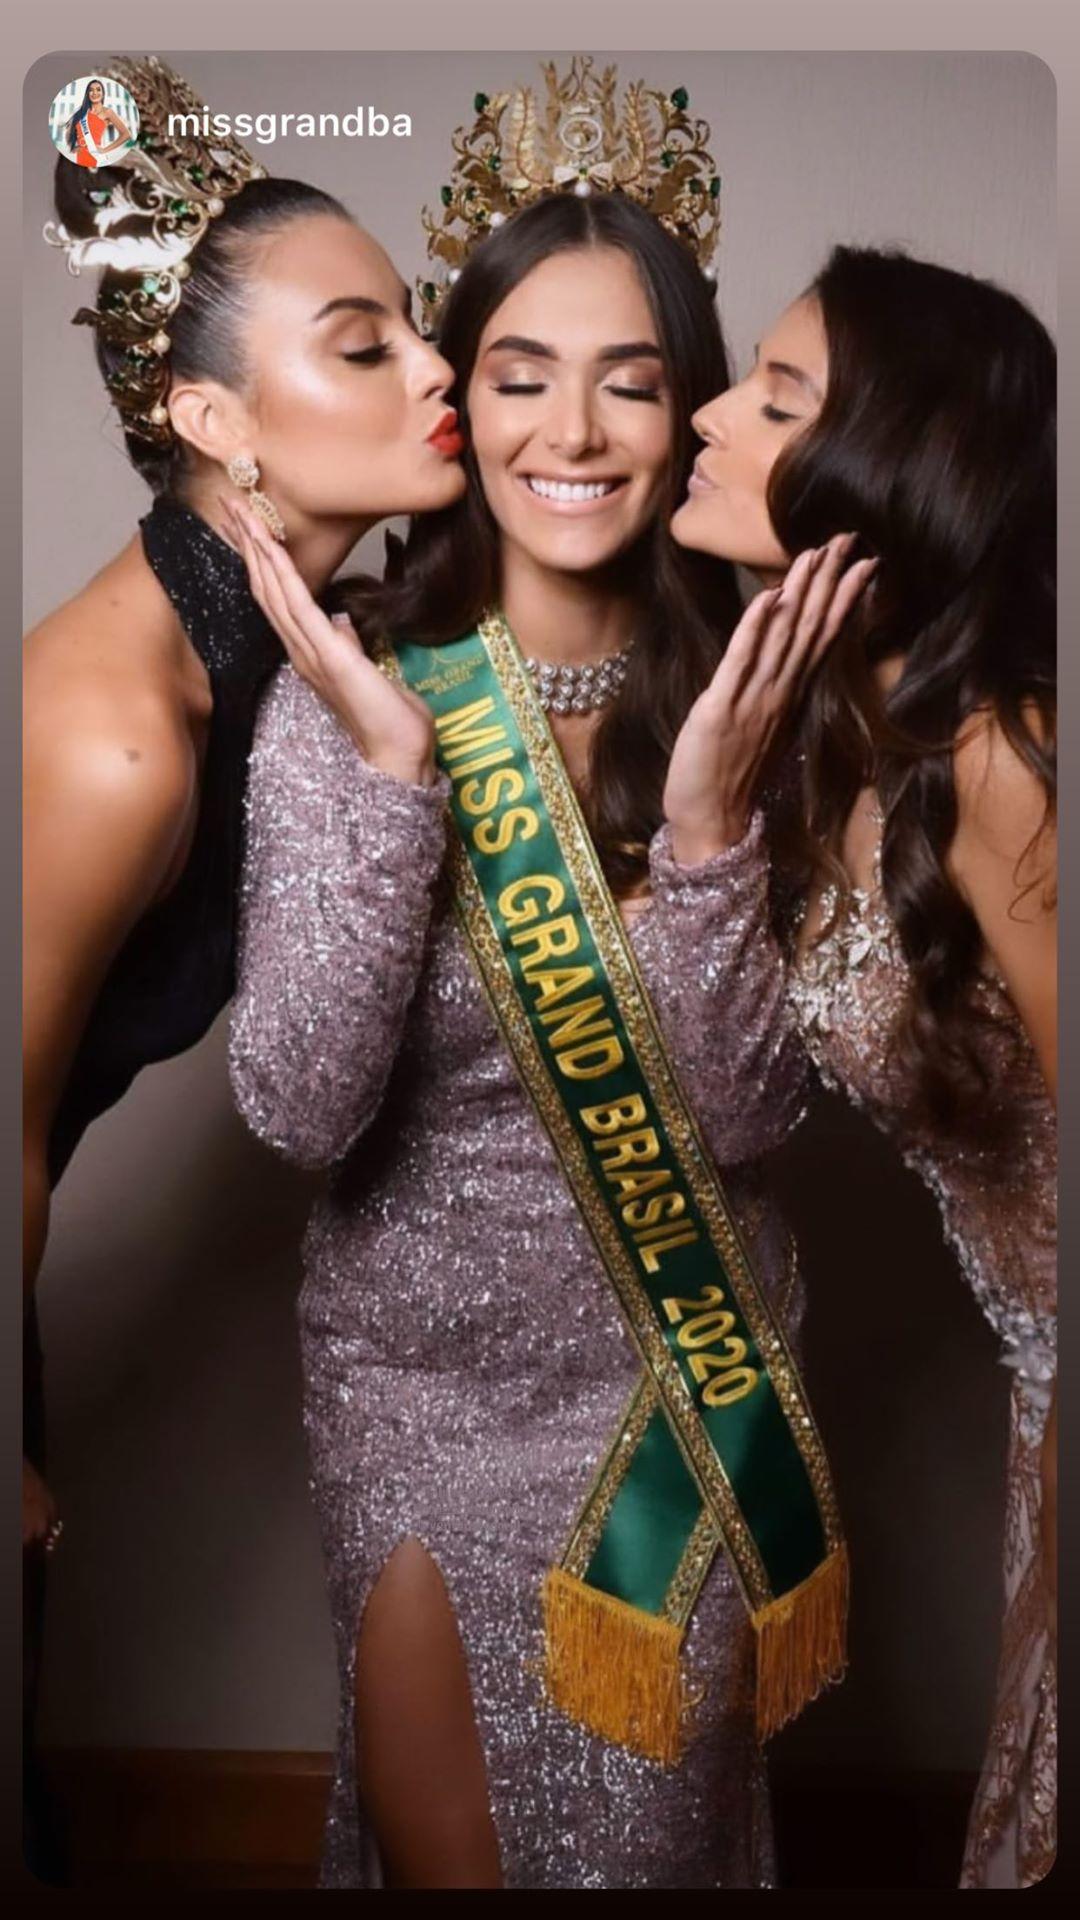 lala guedes, miss grand brasil 2020. - Página 7 90435610